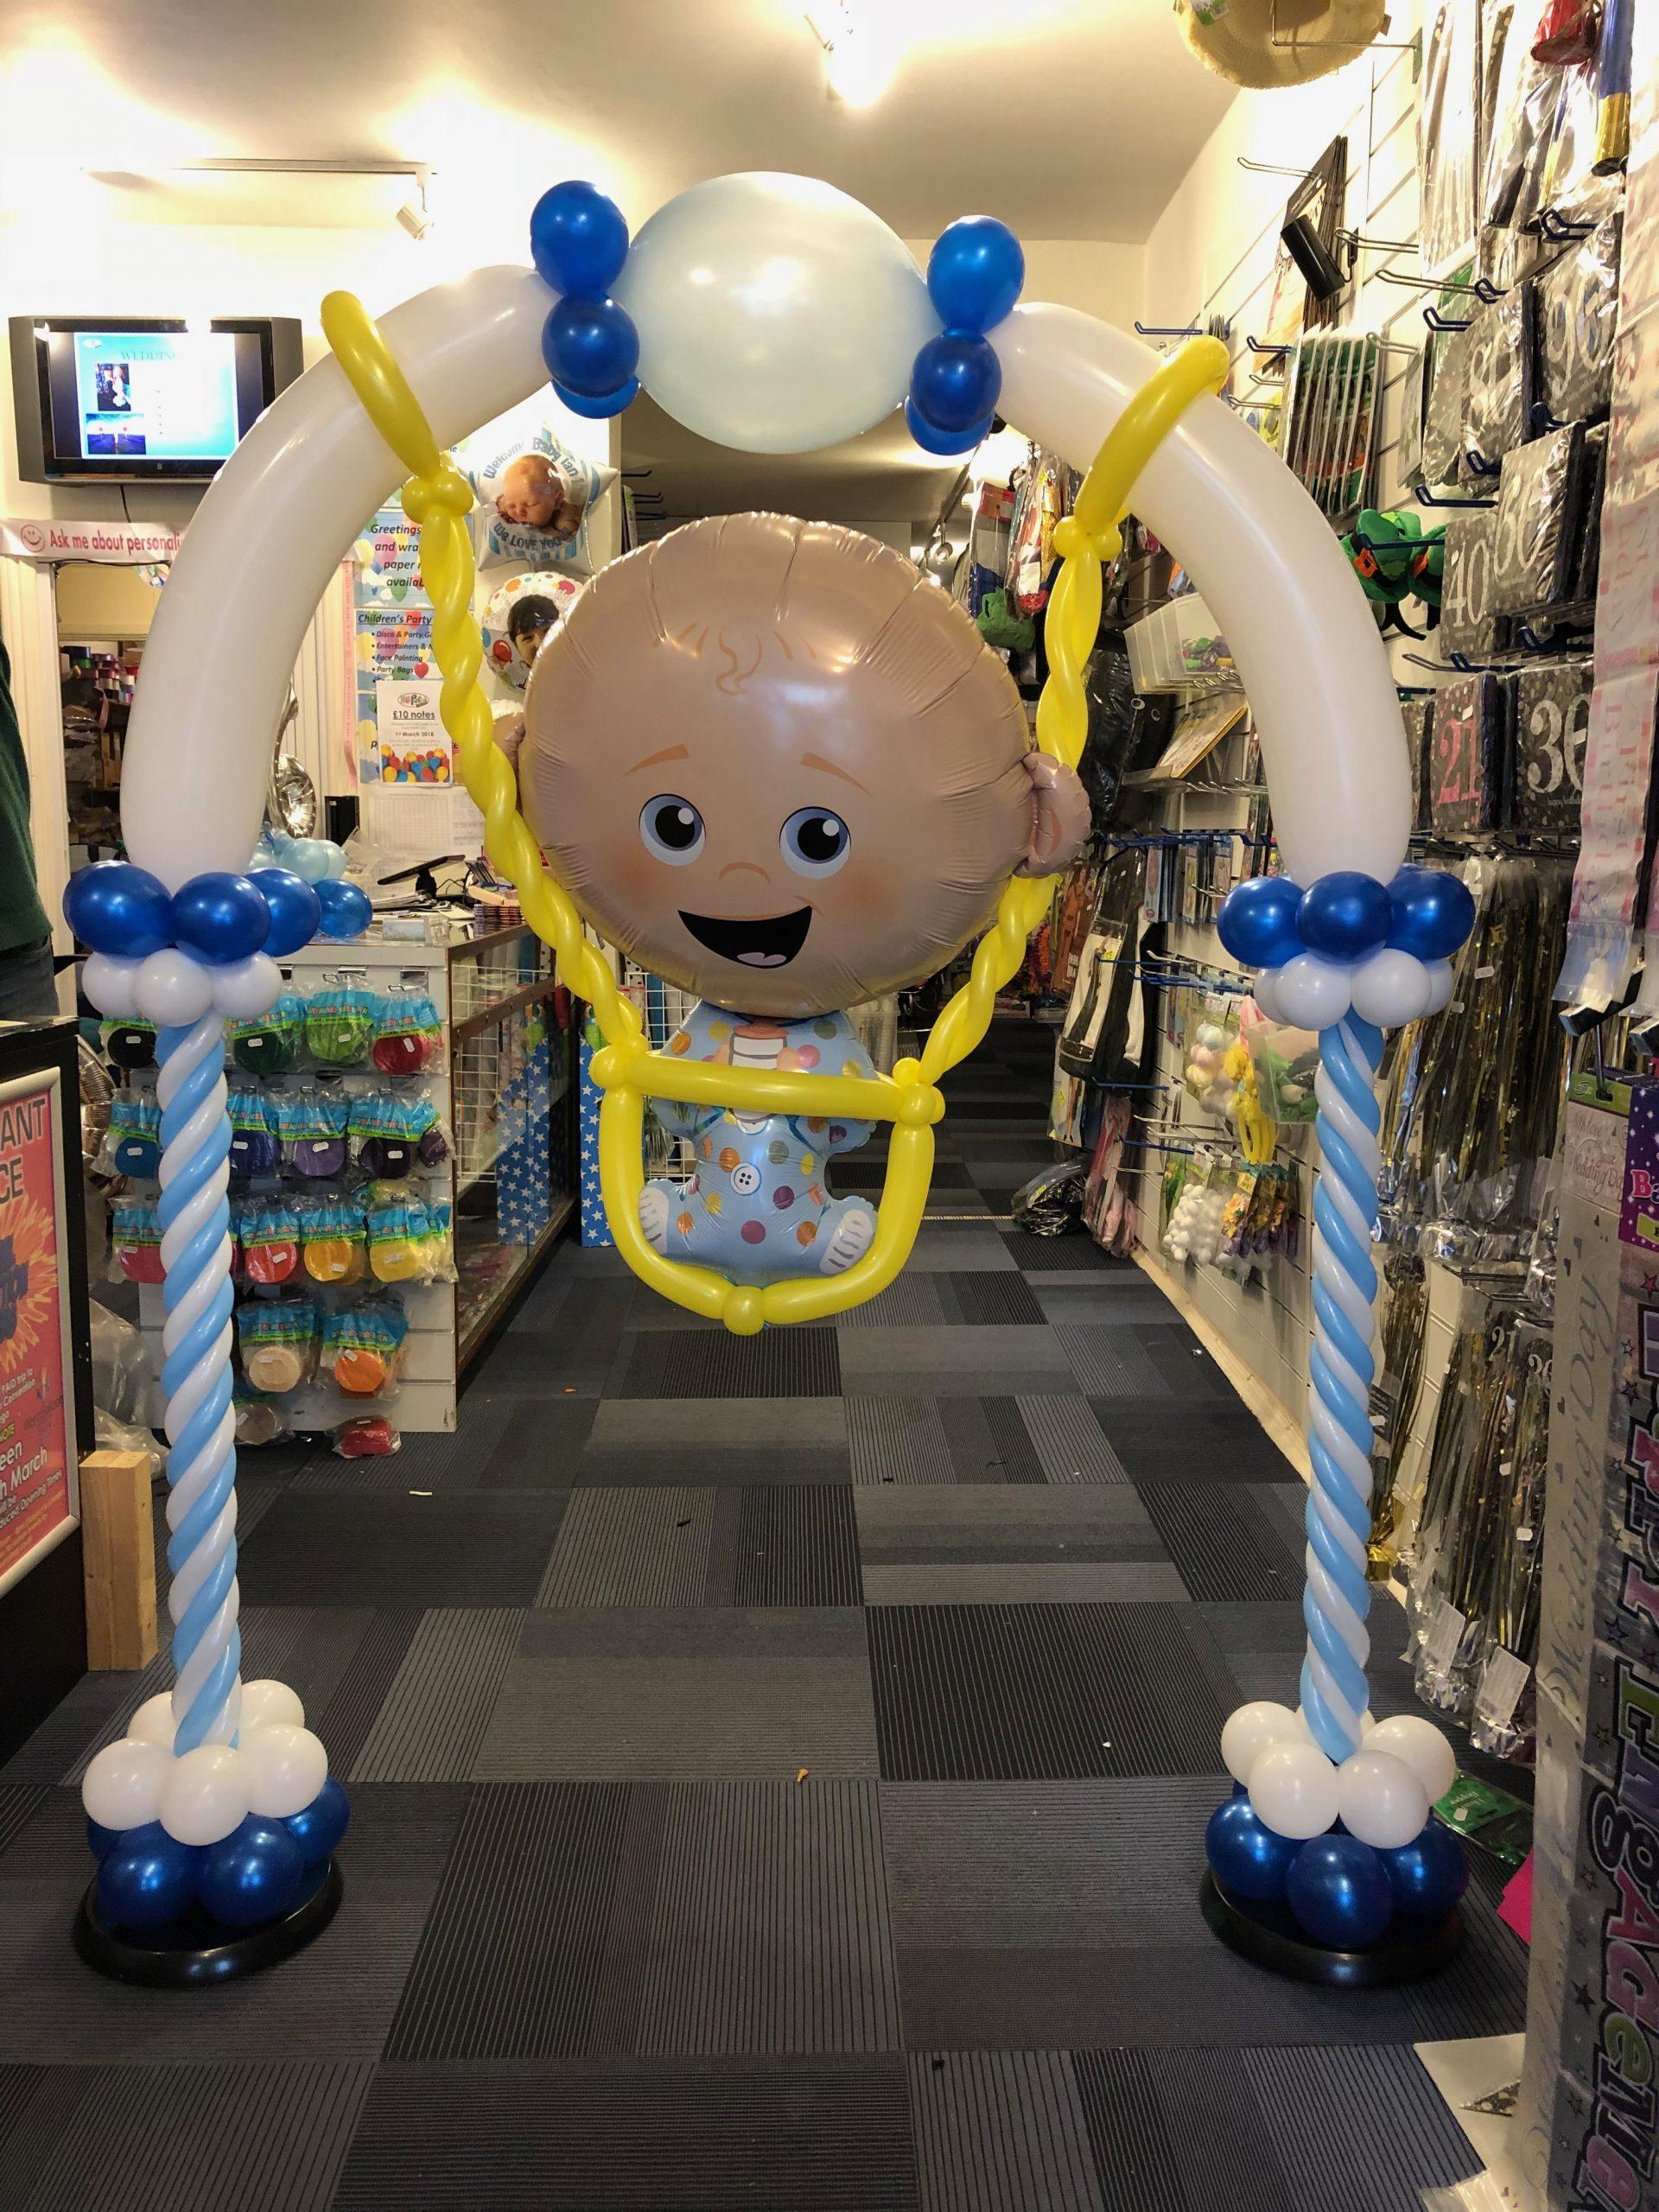 Balloon baby in swing